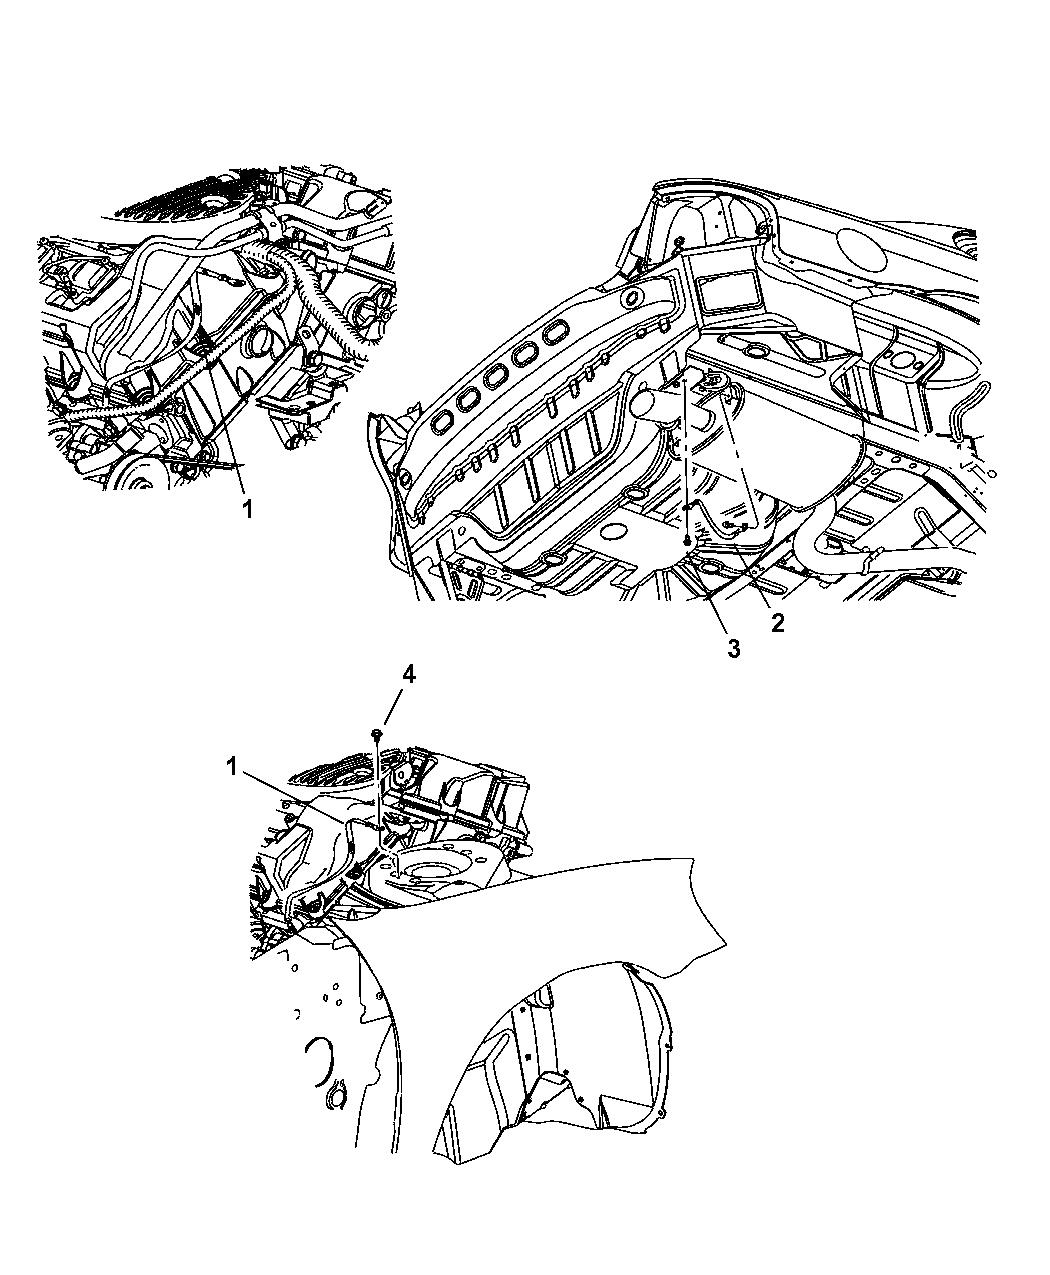 2004 Chrysler Sebring Sedan & Convertible Ground Straps-Engine